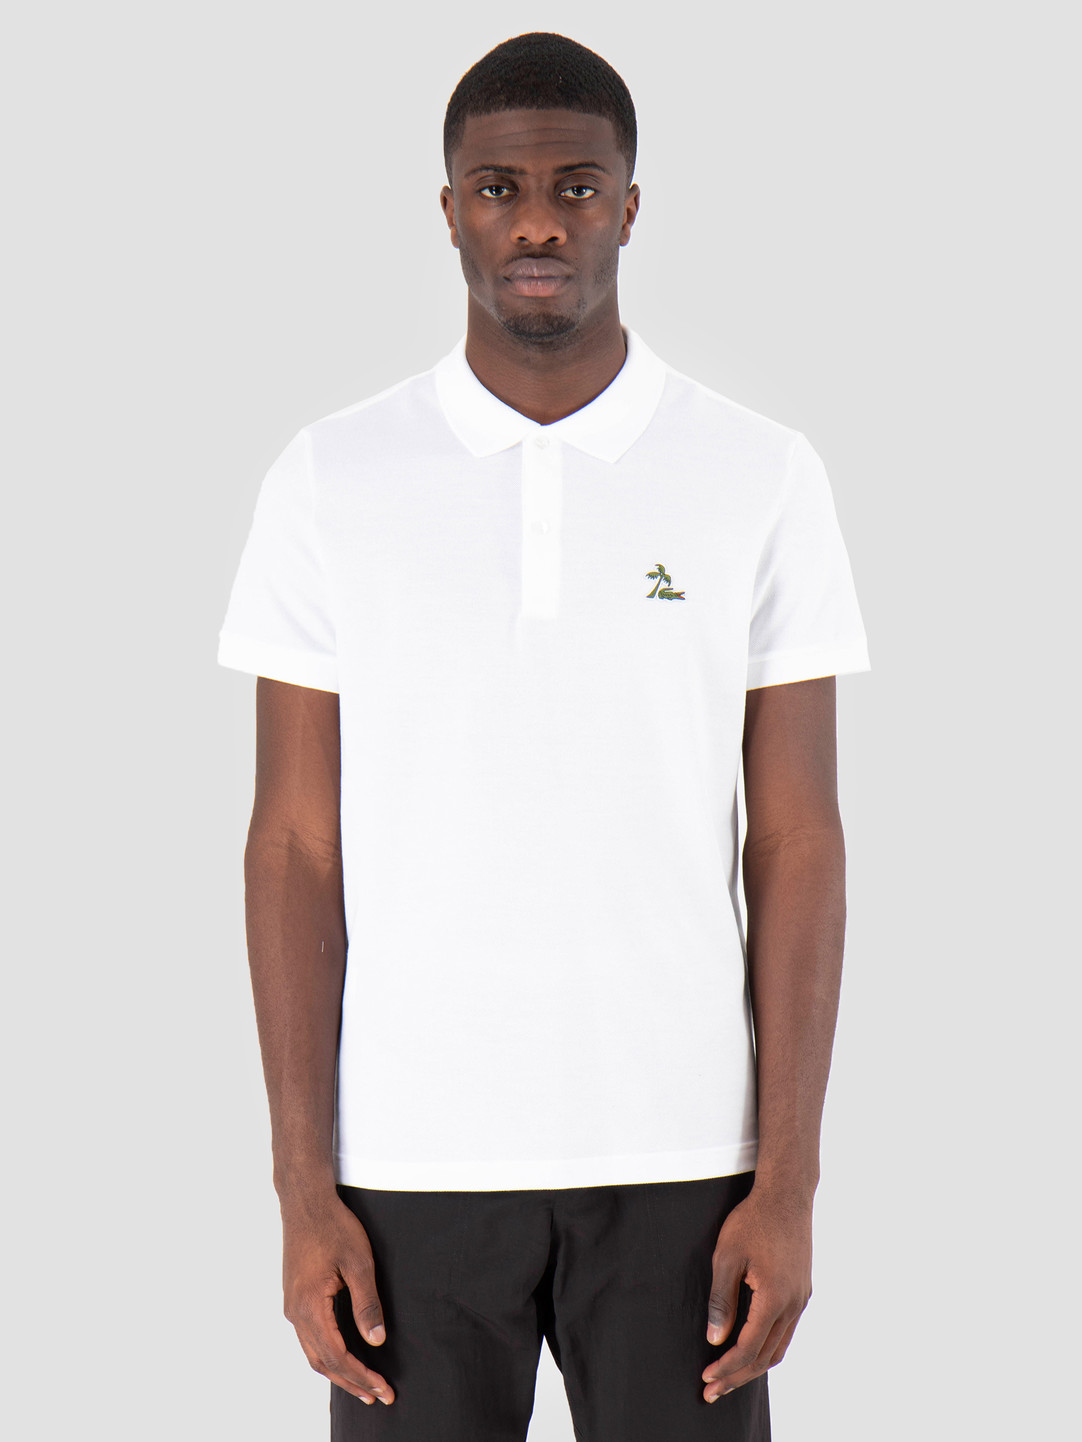 Lacoste Lacoste 1Hp3 Men'S T-Shirt Polo 03 White Ph4258-91